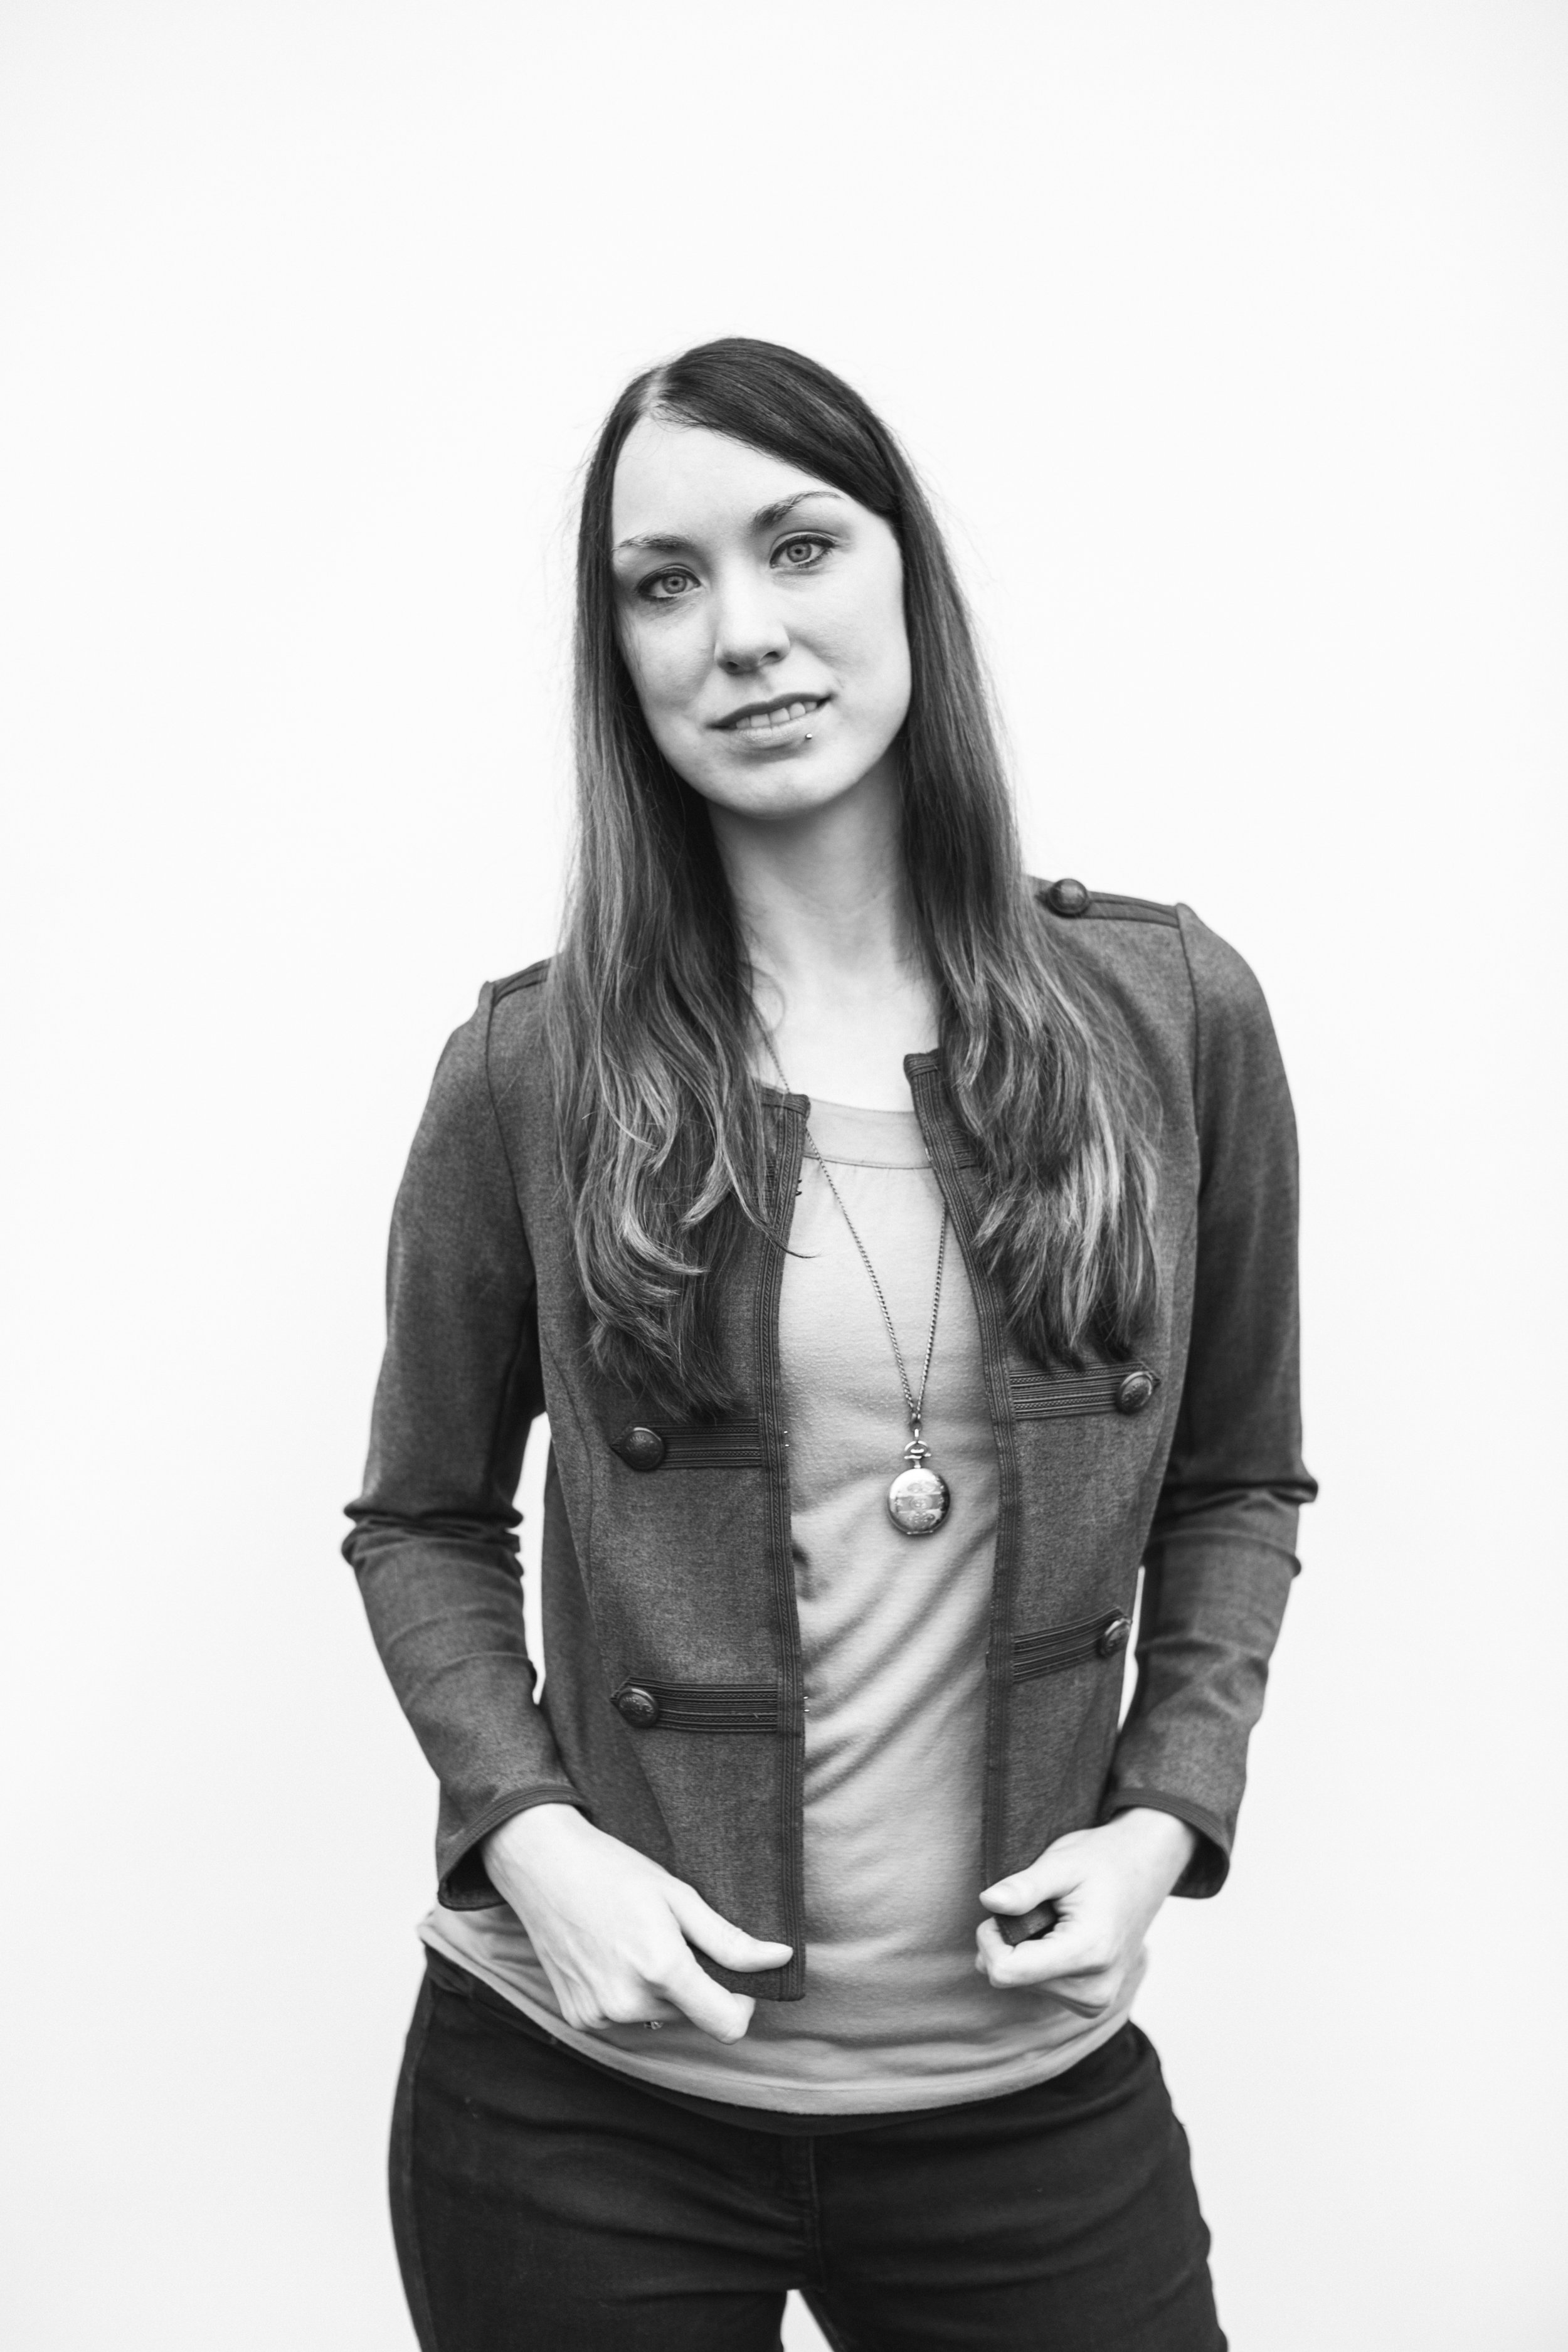 Sonja-Rostad-9273.jpg